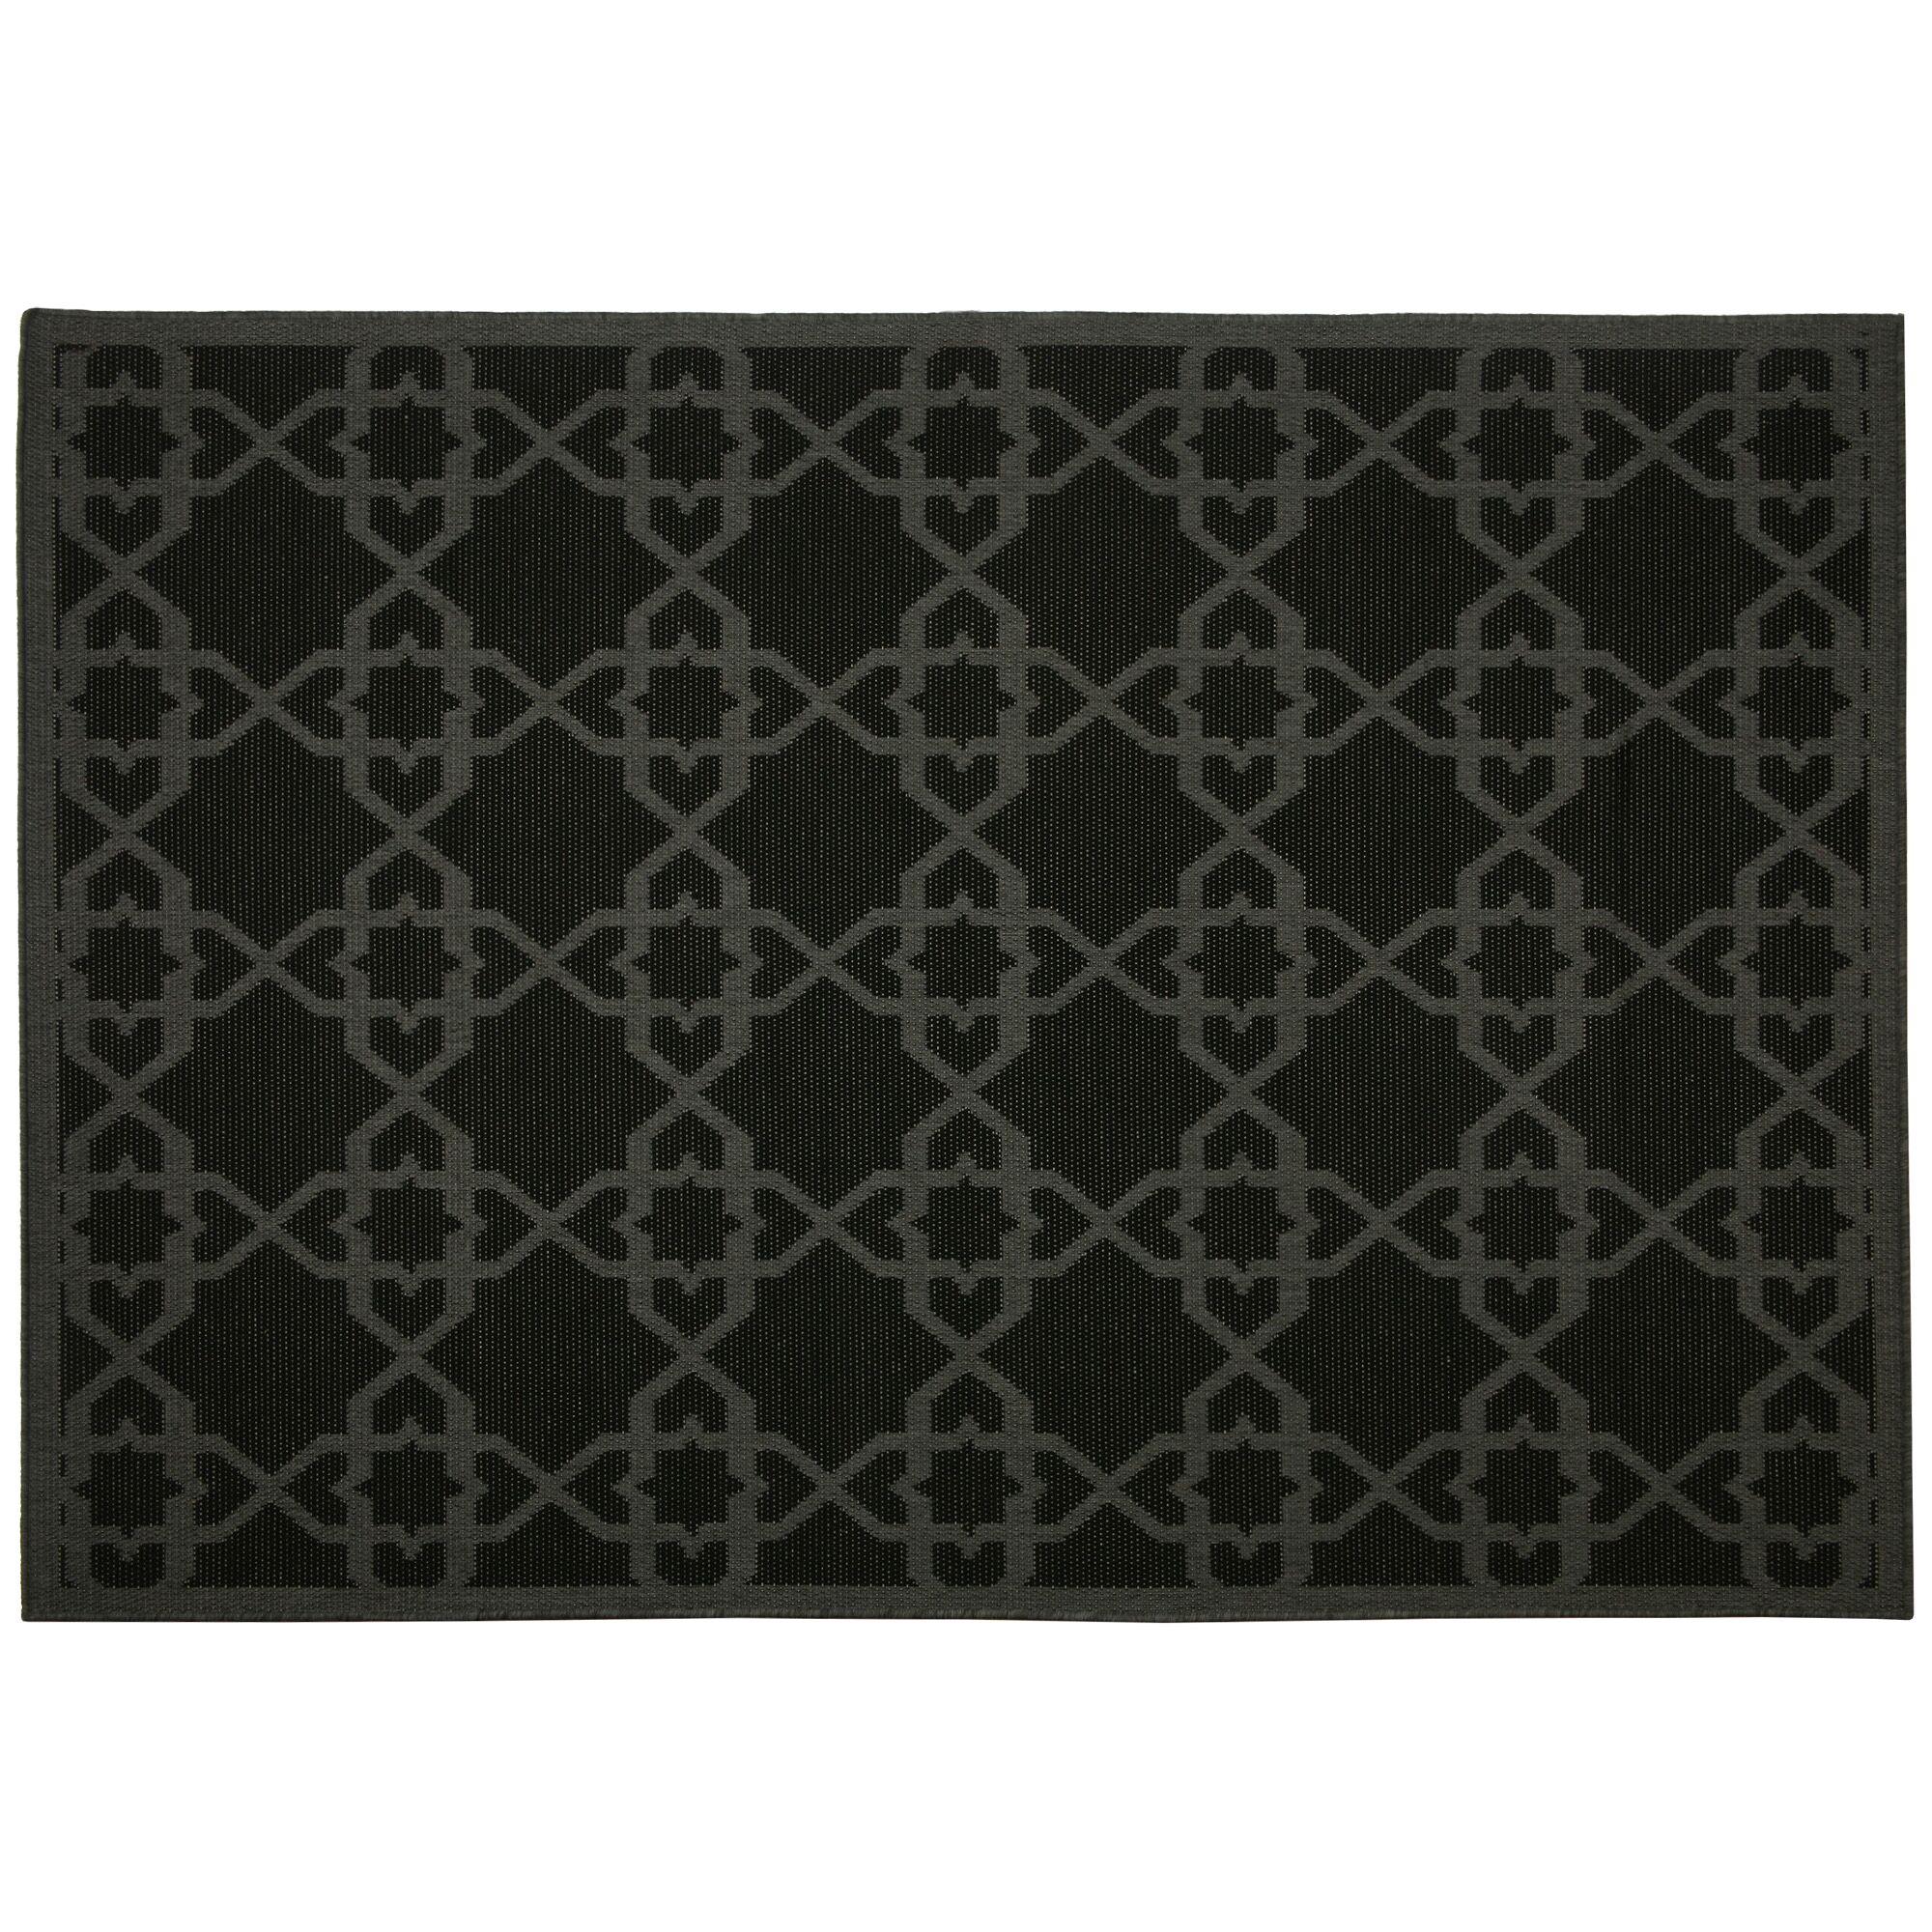 Eduardo Black Geometric Indoor/Outdoor Area Rug Rug Size: Rectangle 2' x 3'